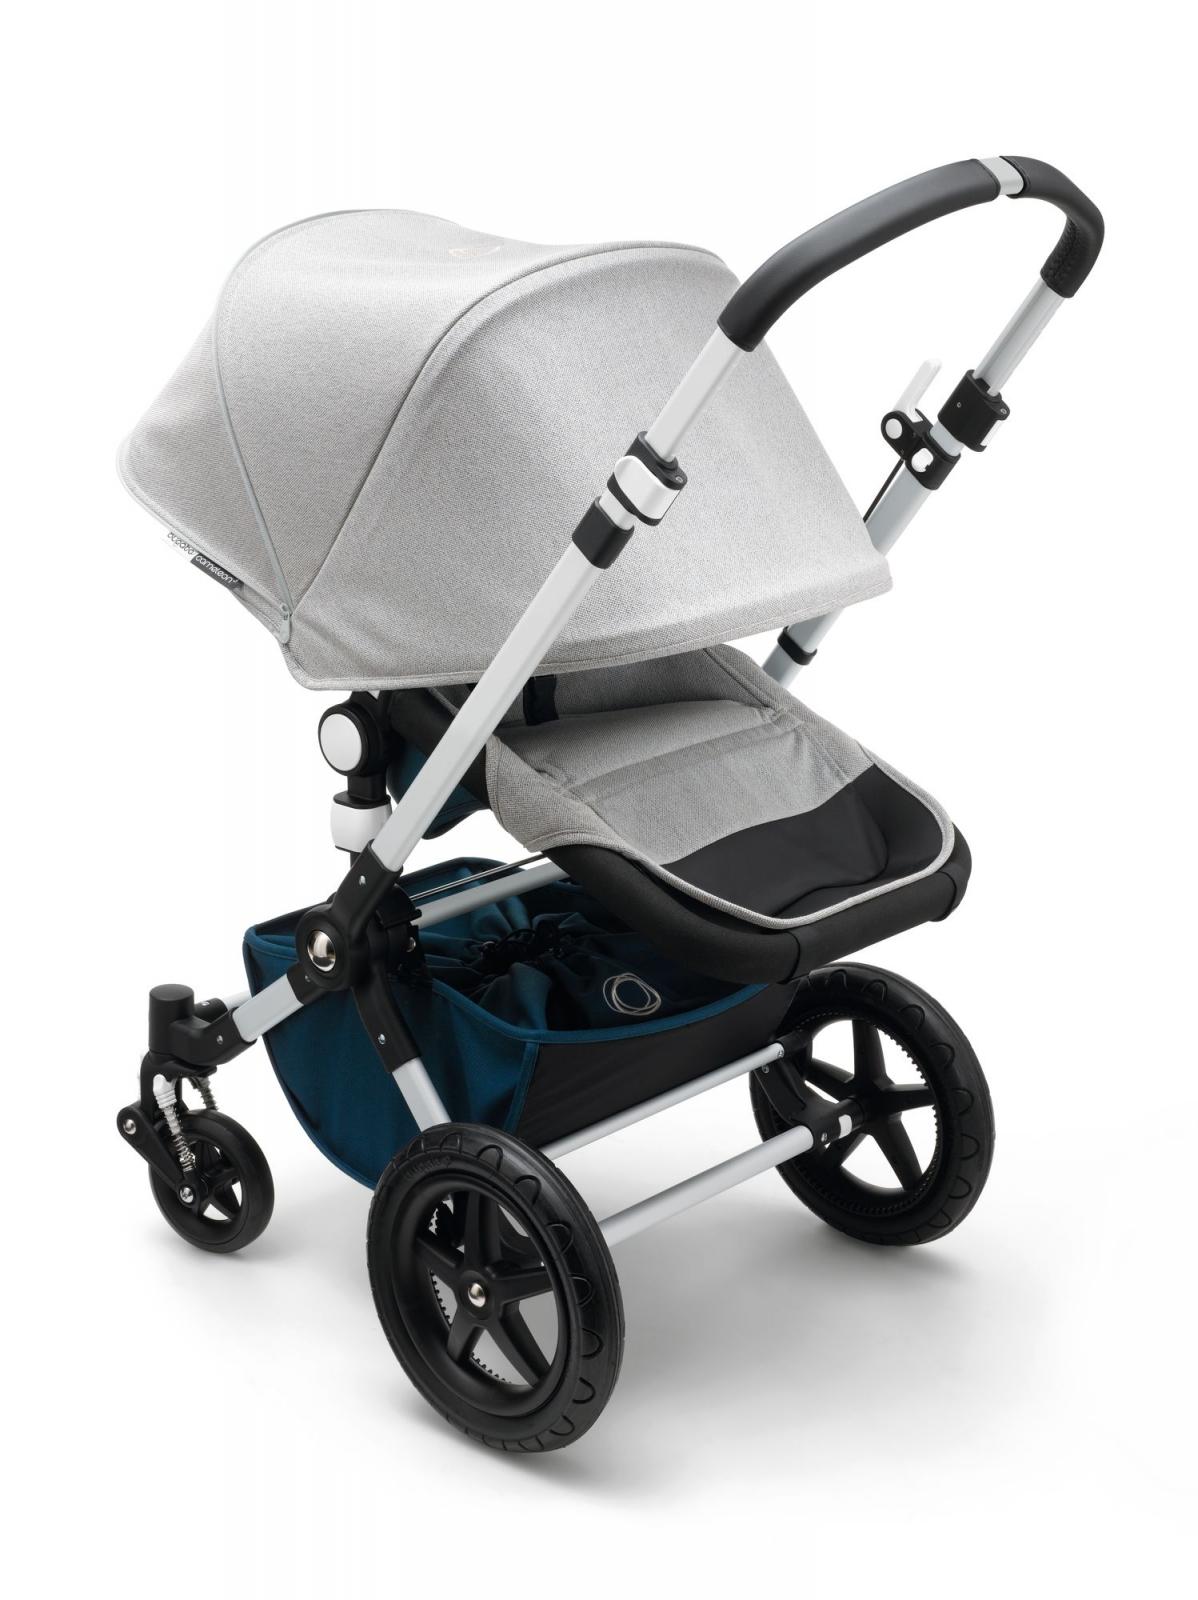 Schommelstoel Baby Graco.4moms Stoel Koeka Deken Teddy Vizela Baby Plus B V